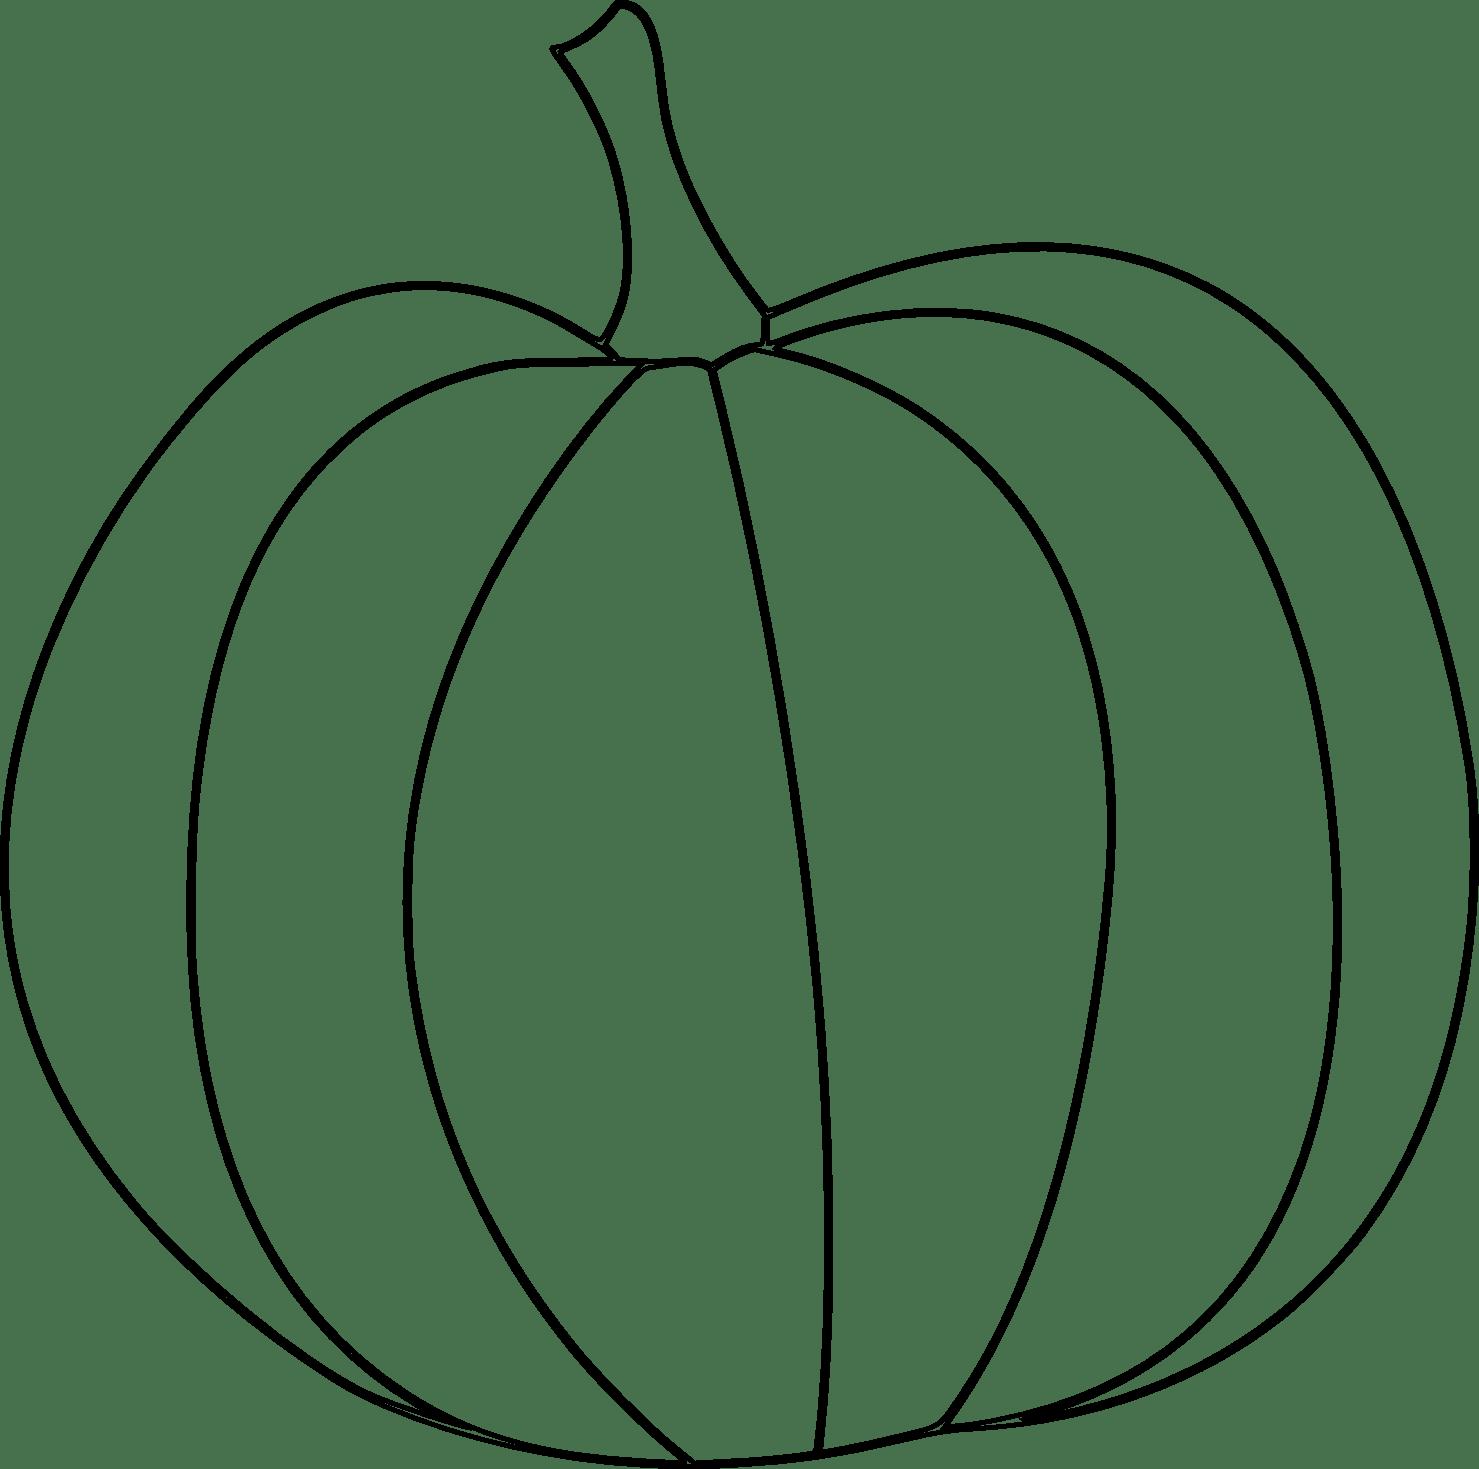 Pumpkin Drawing